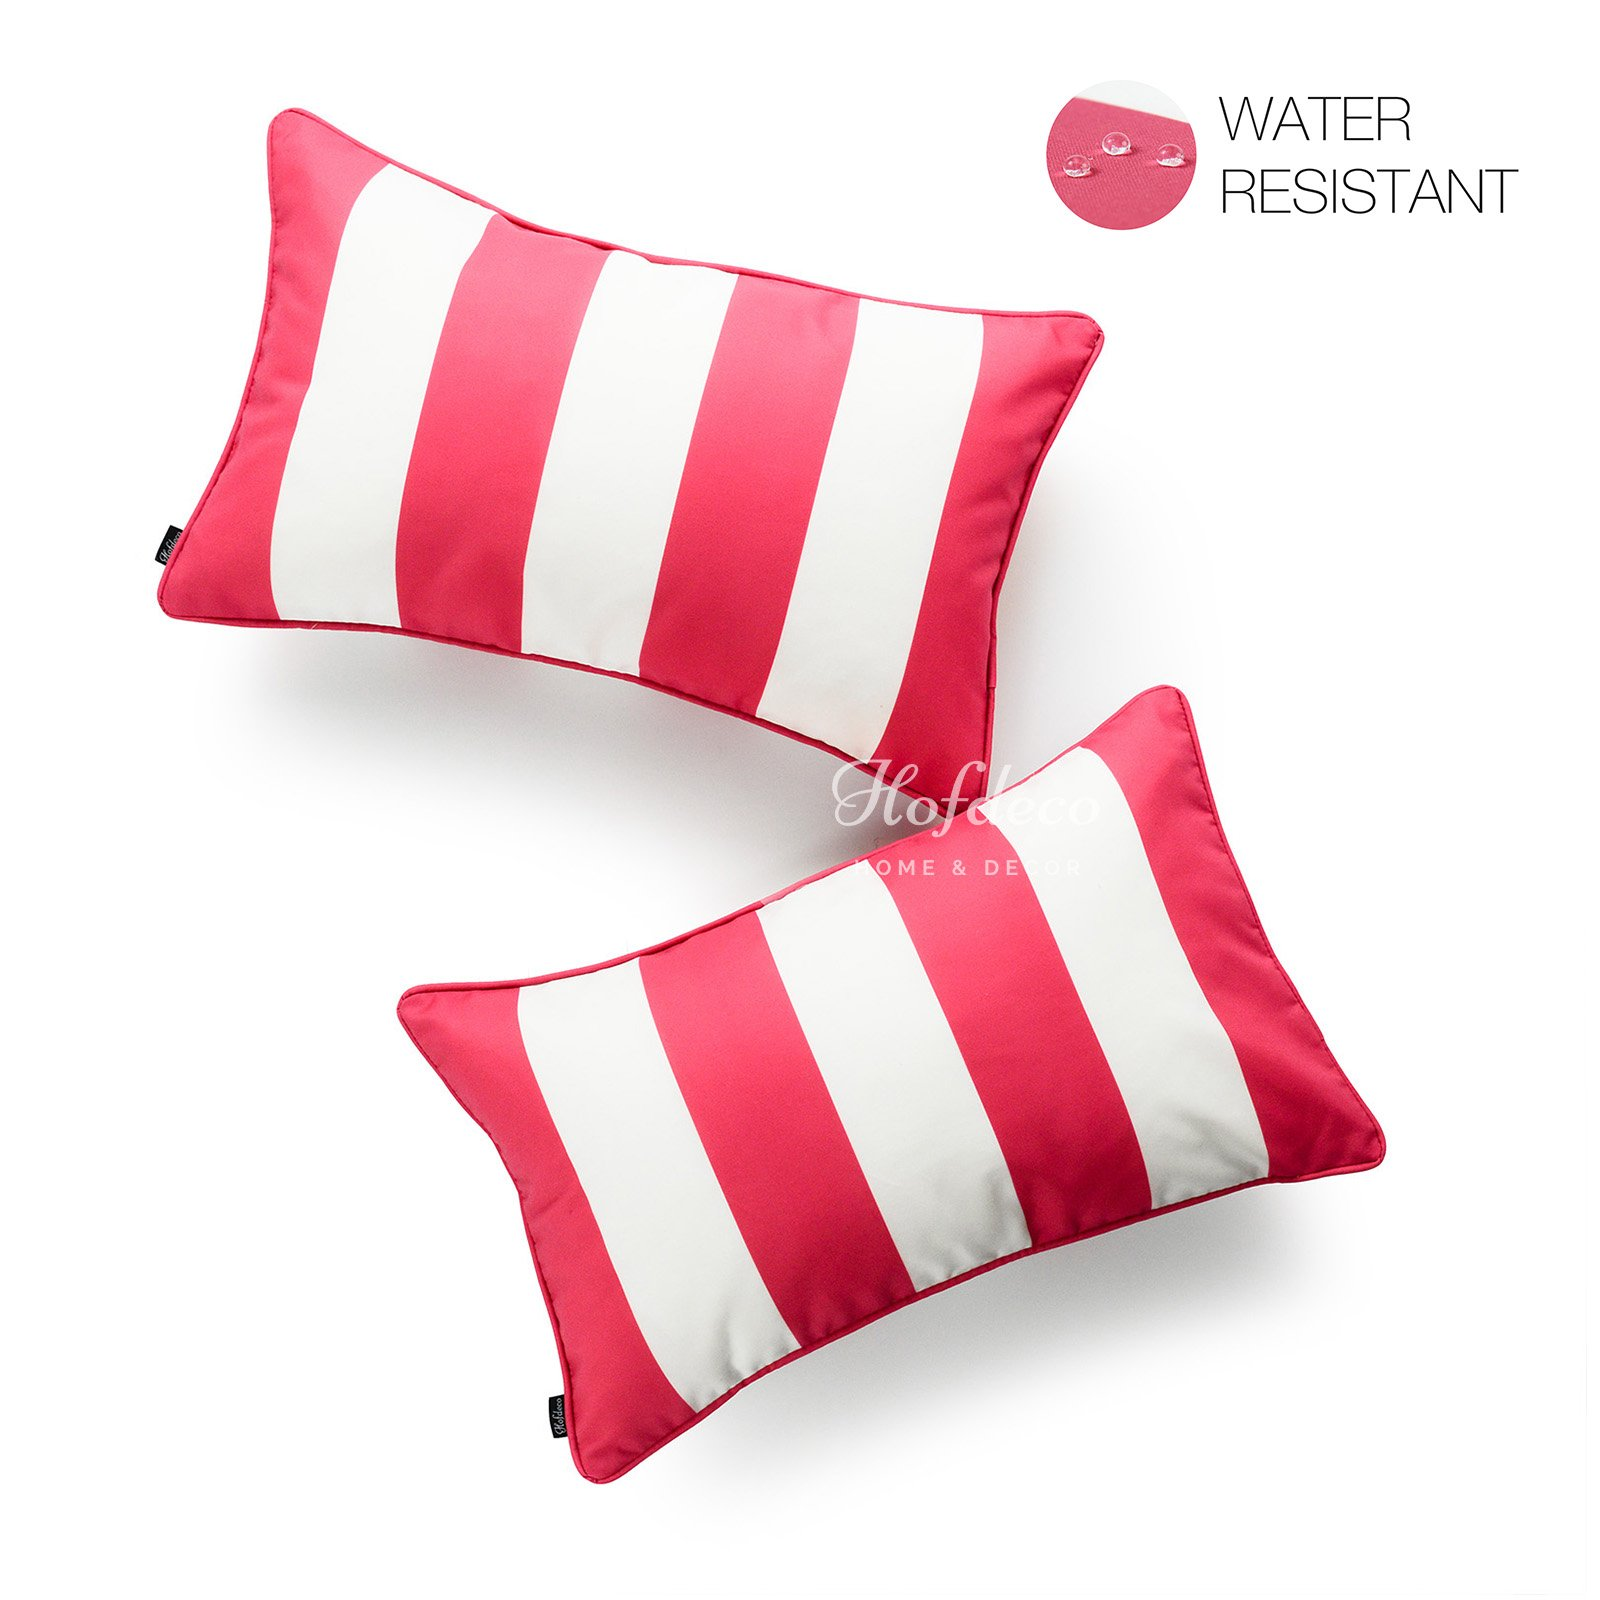 Hofdeco Decorative Lumbar Pillow Cover INDOOR OUTDOOR WATER RESISTANT Canvas Hot Pink Stripes 12''x20'' Set of 2